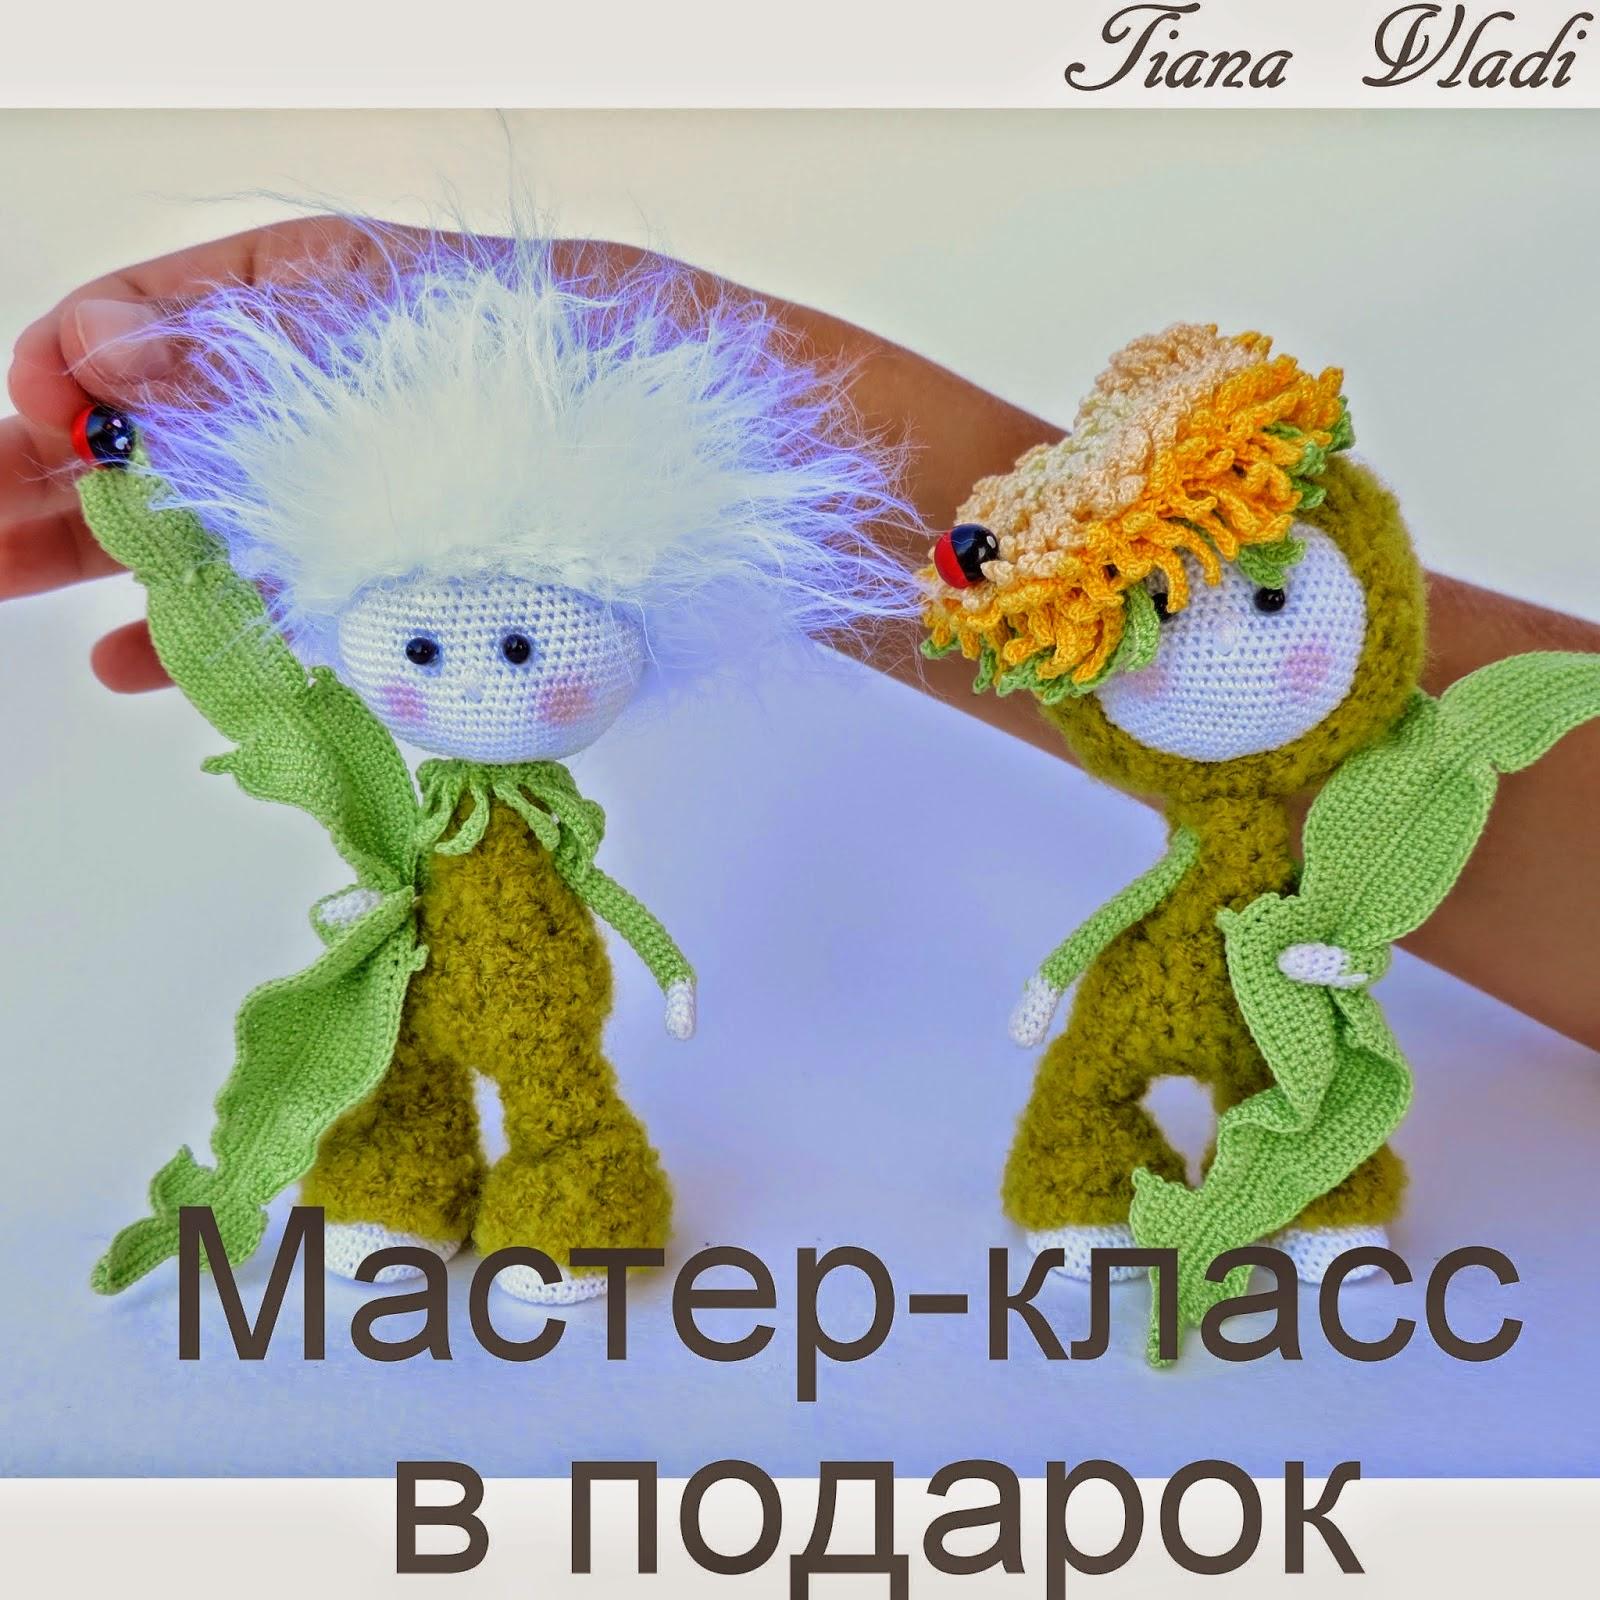 http://www.tiana-vladi.ru/2014/09/blog-post_3.html